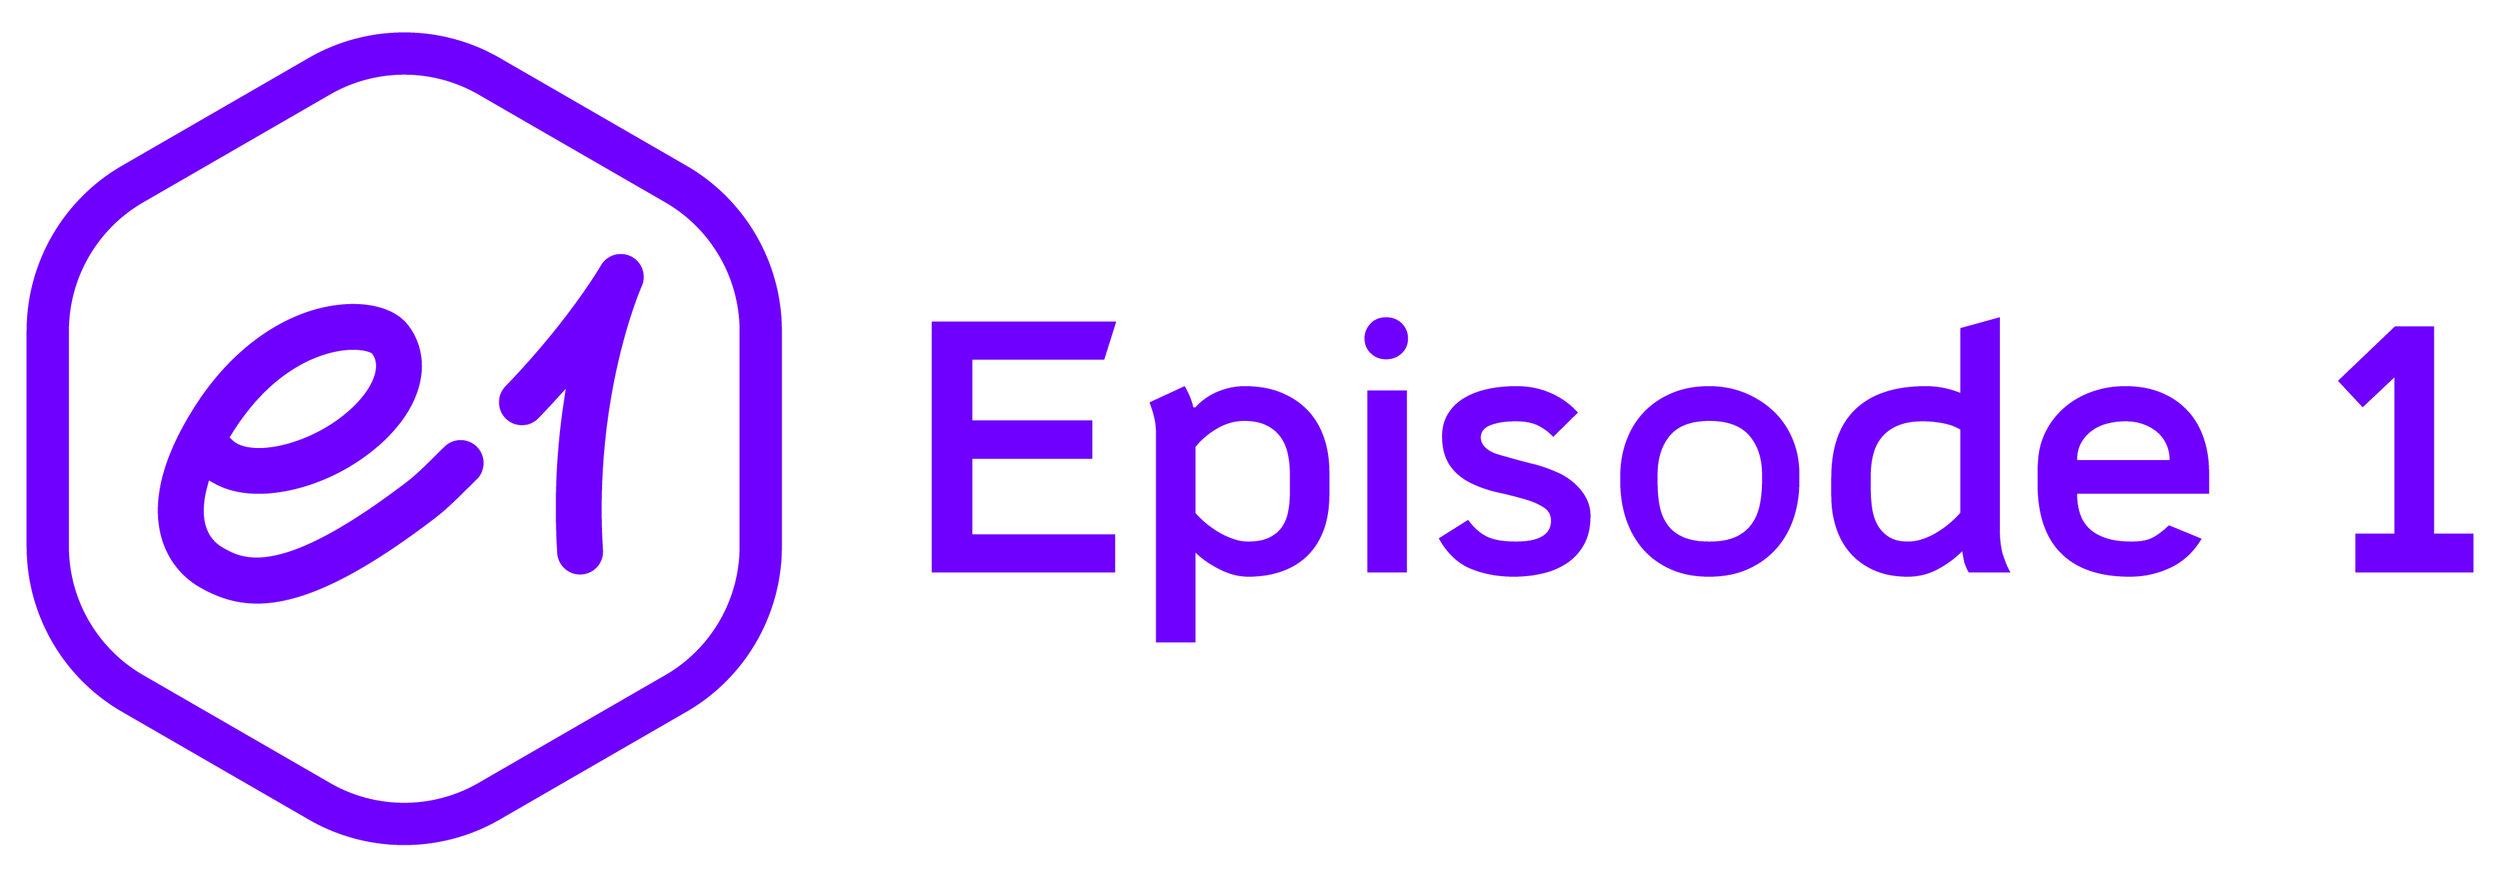 Episode1Logo-master-01 (3).jpg